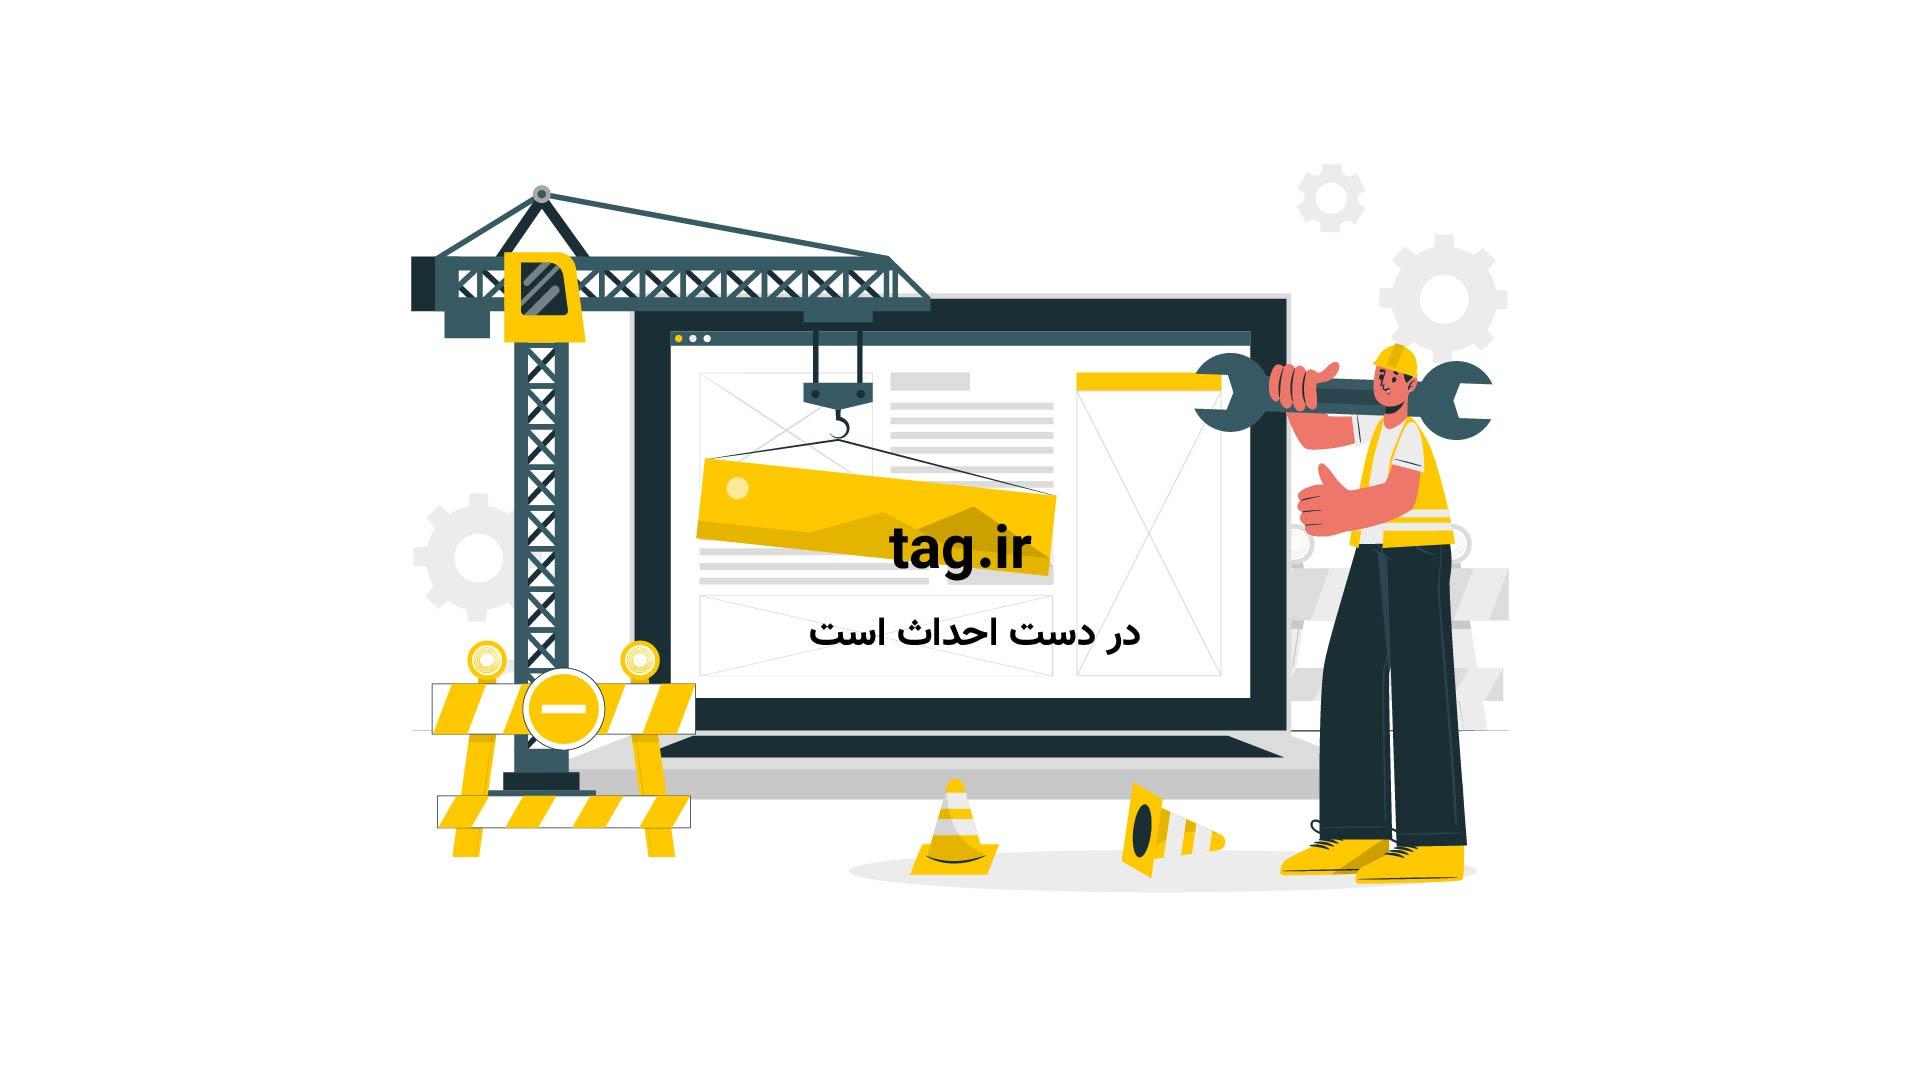 میوه-ها-انگلیسی